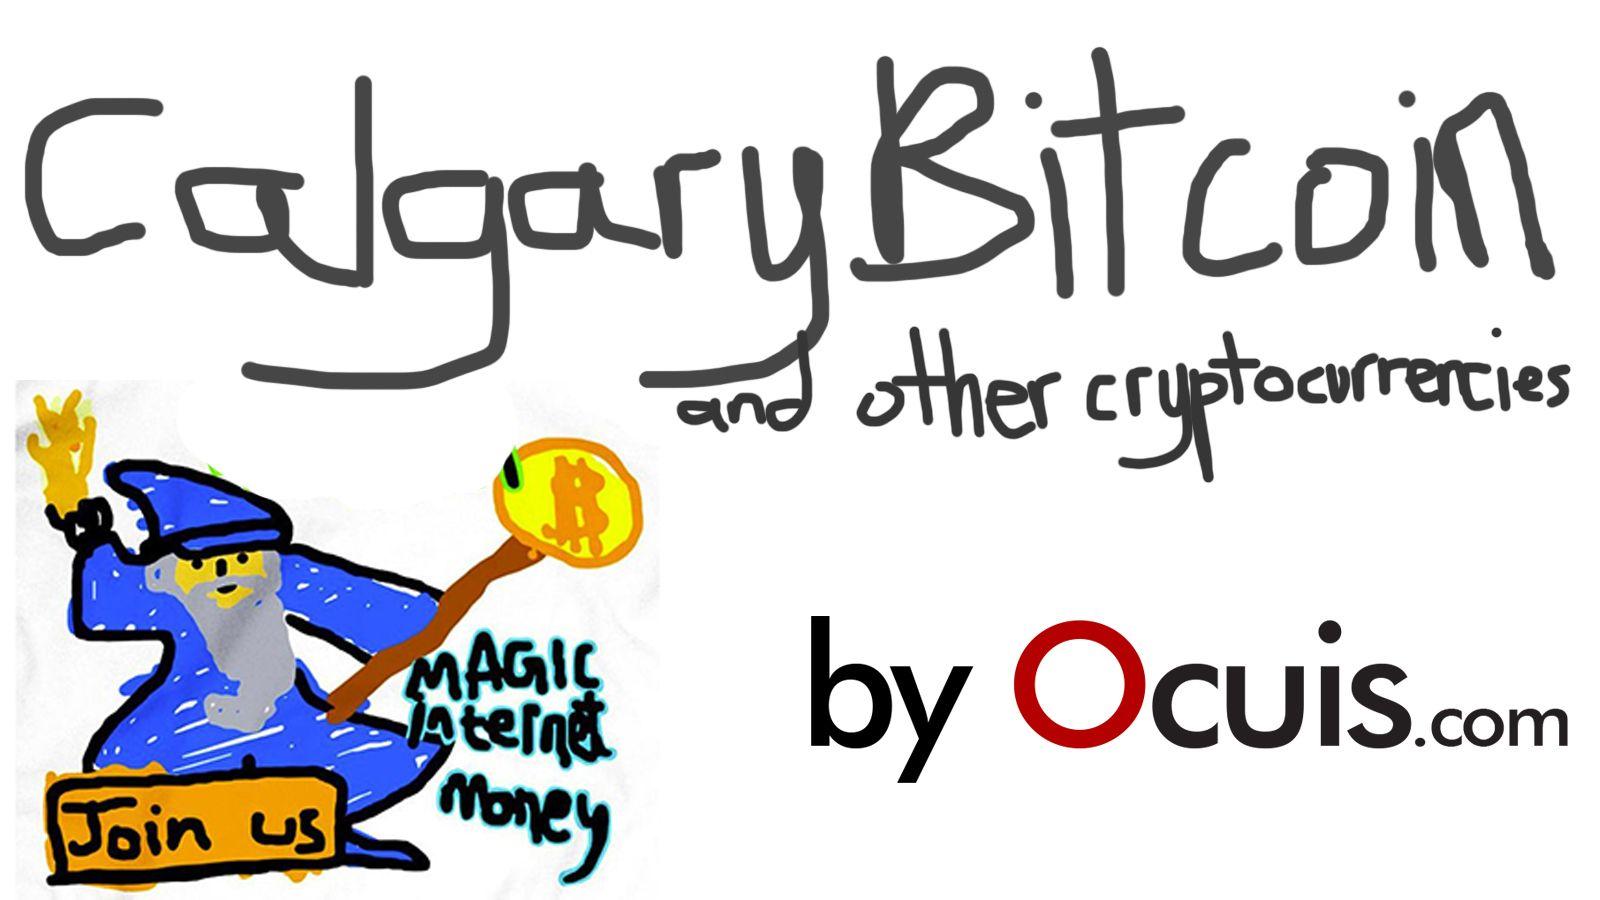 Calgary Bitcoin